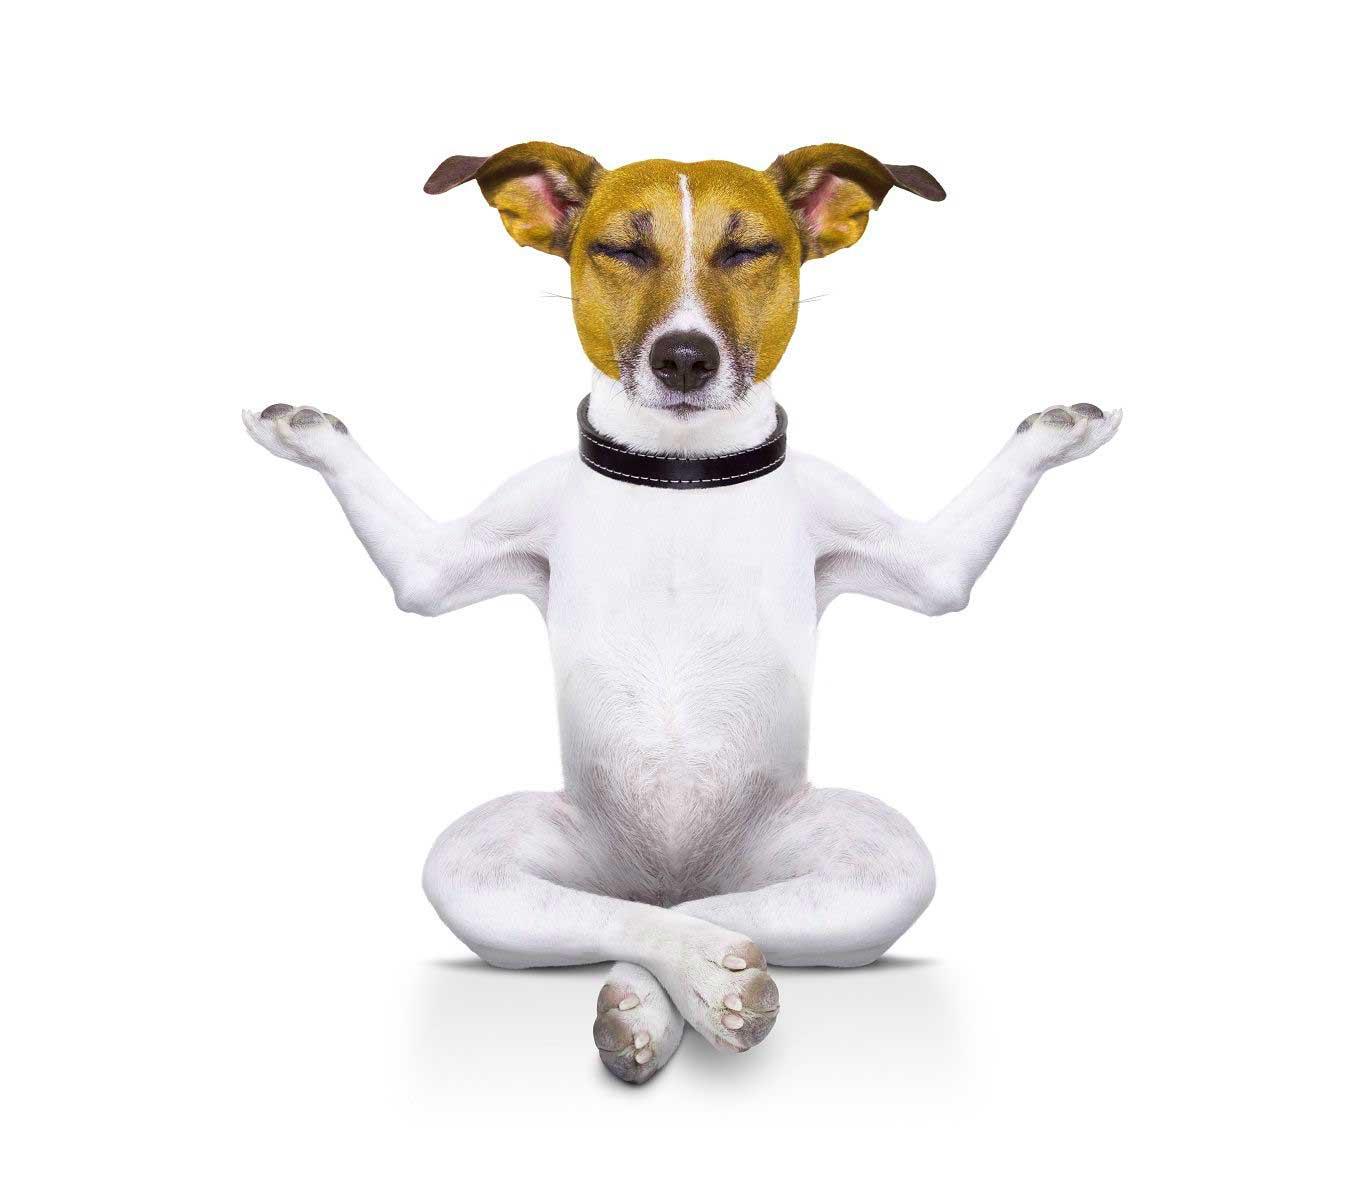 Dog Latest Funny Whatsapp DP Wallpaper Download